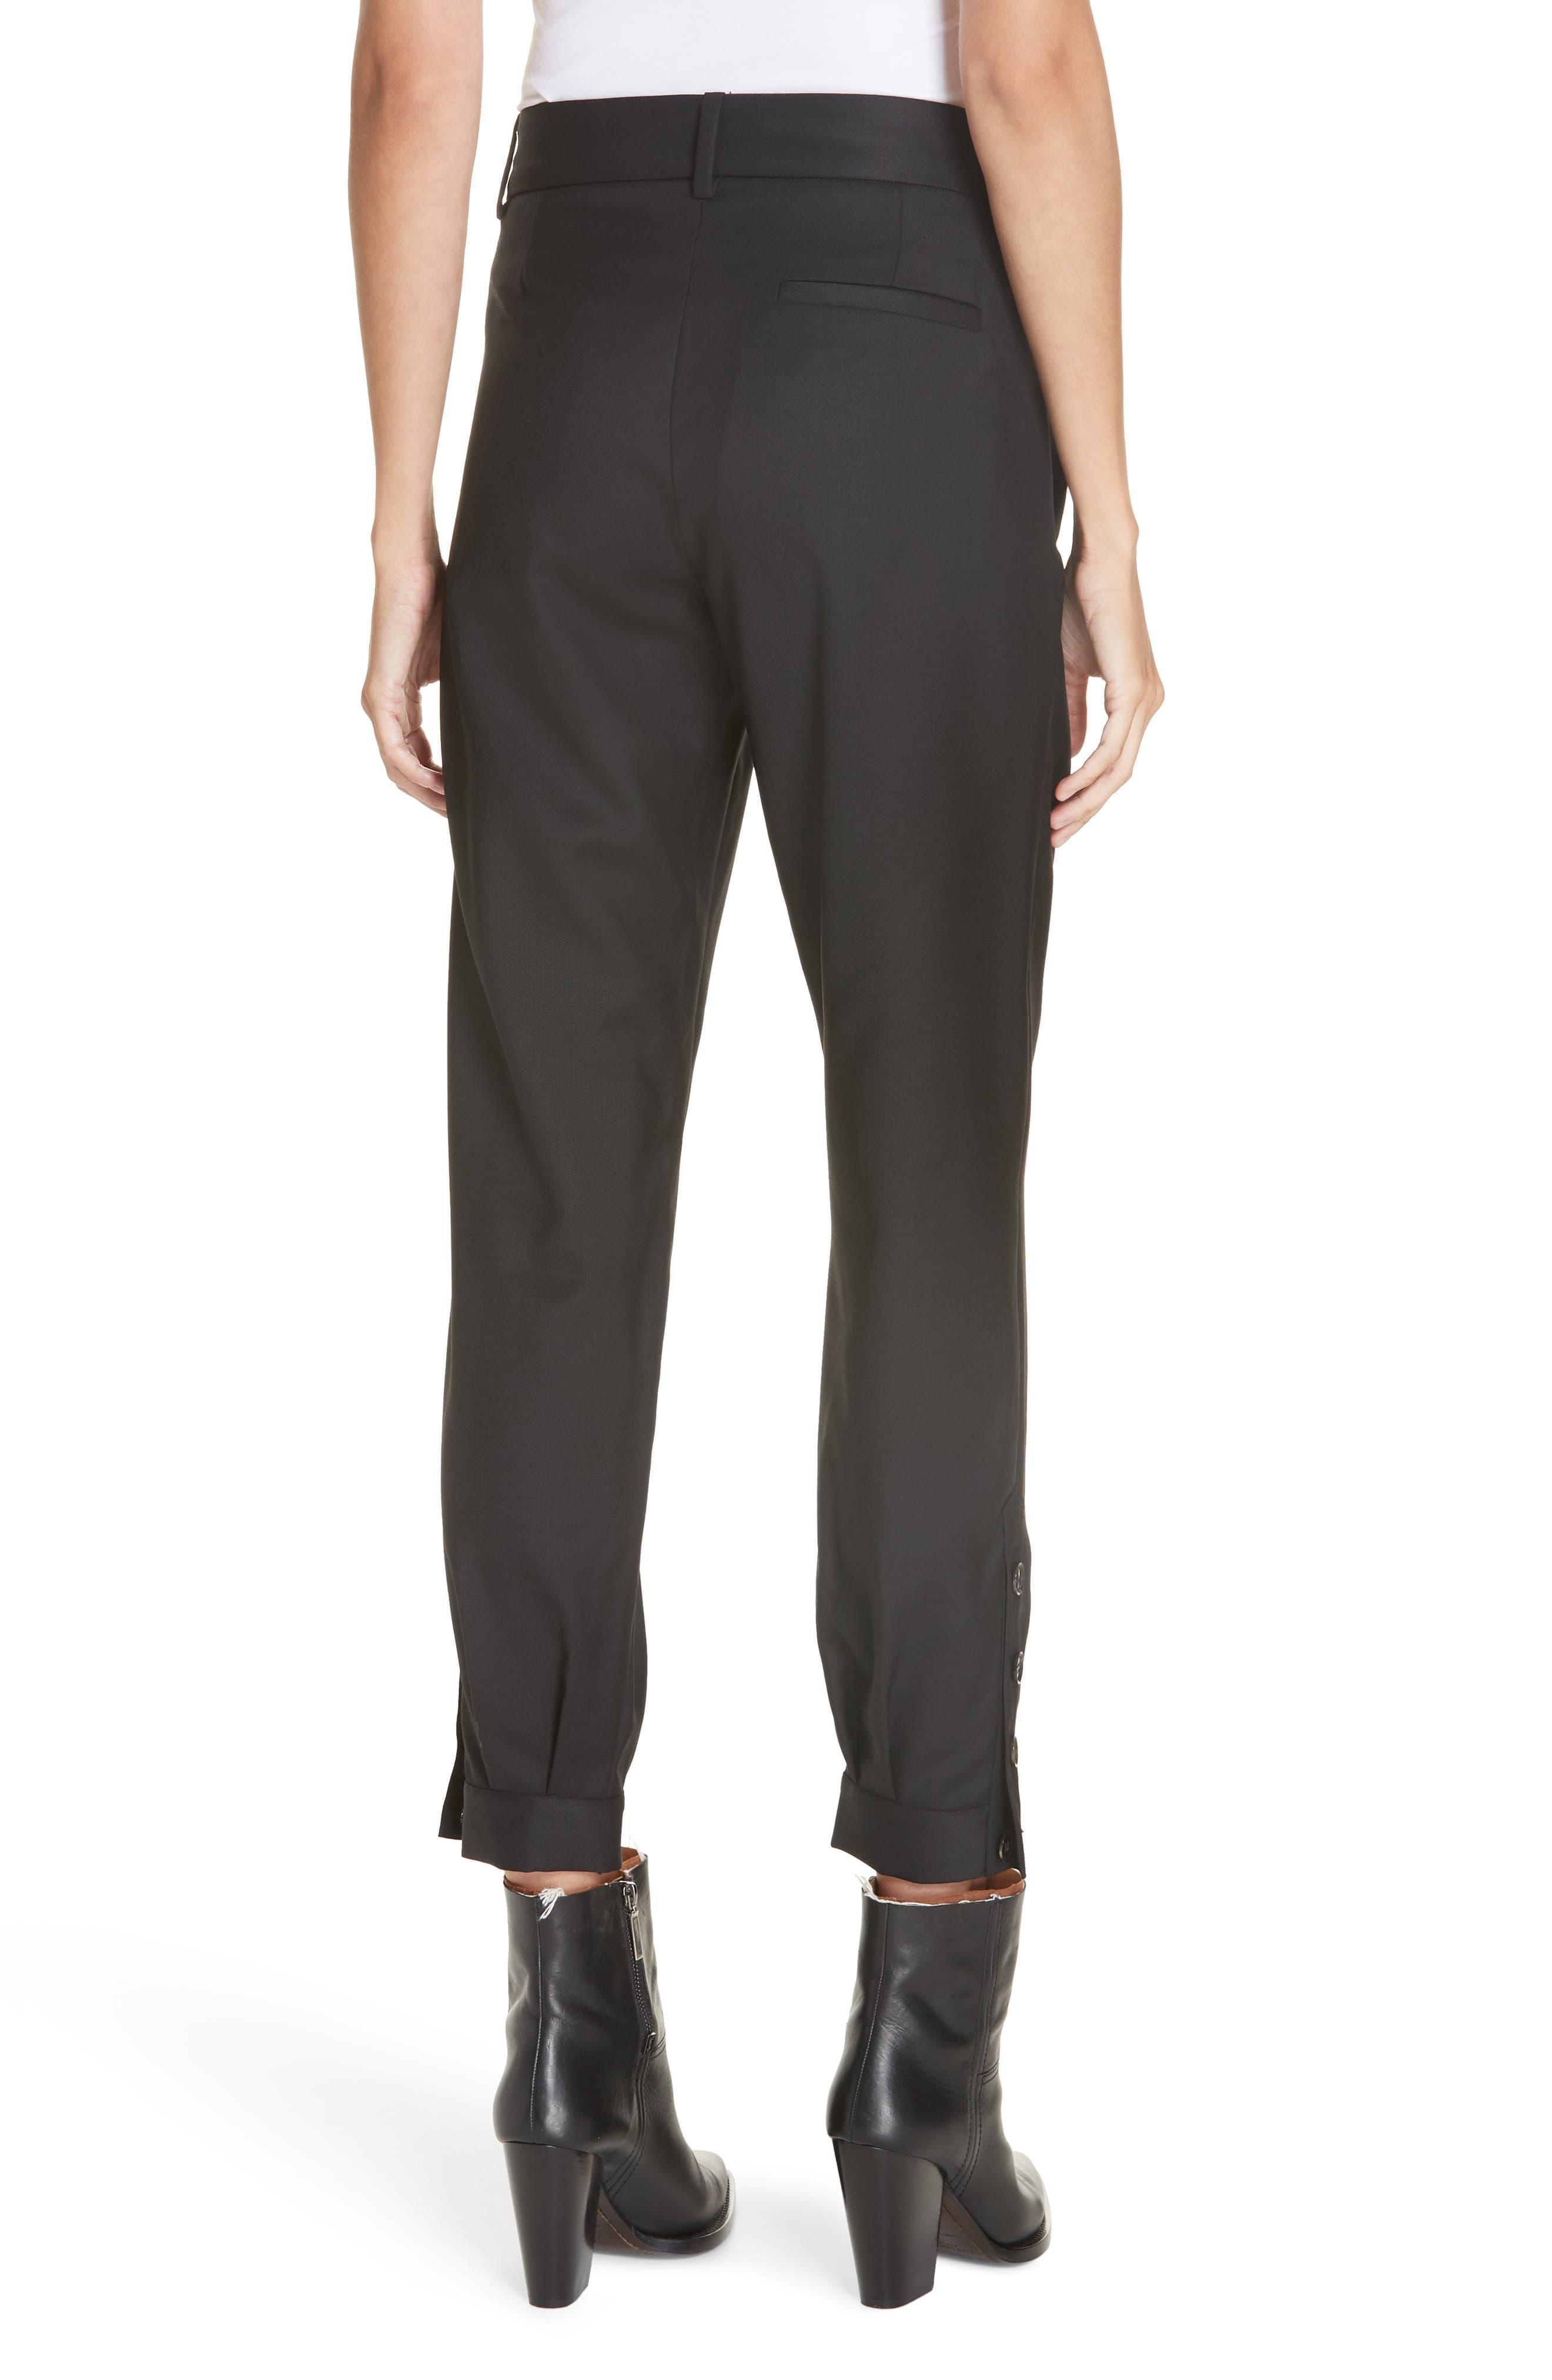 NILI LOTAN, Bertina Pleated Wool Crop Pants, Alternate thumbnail 2, color, BLACK